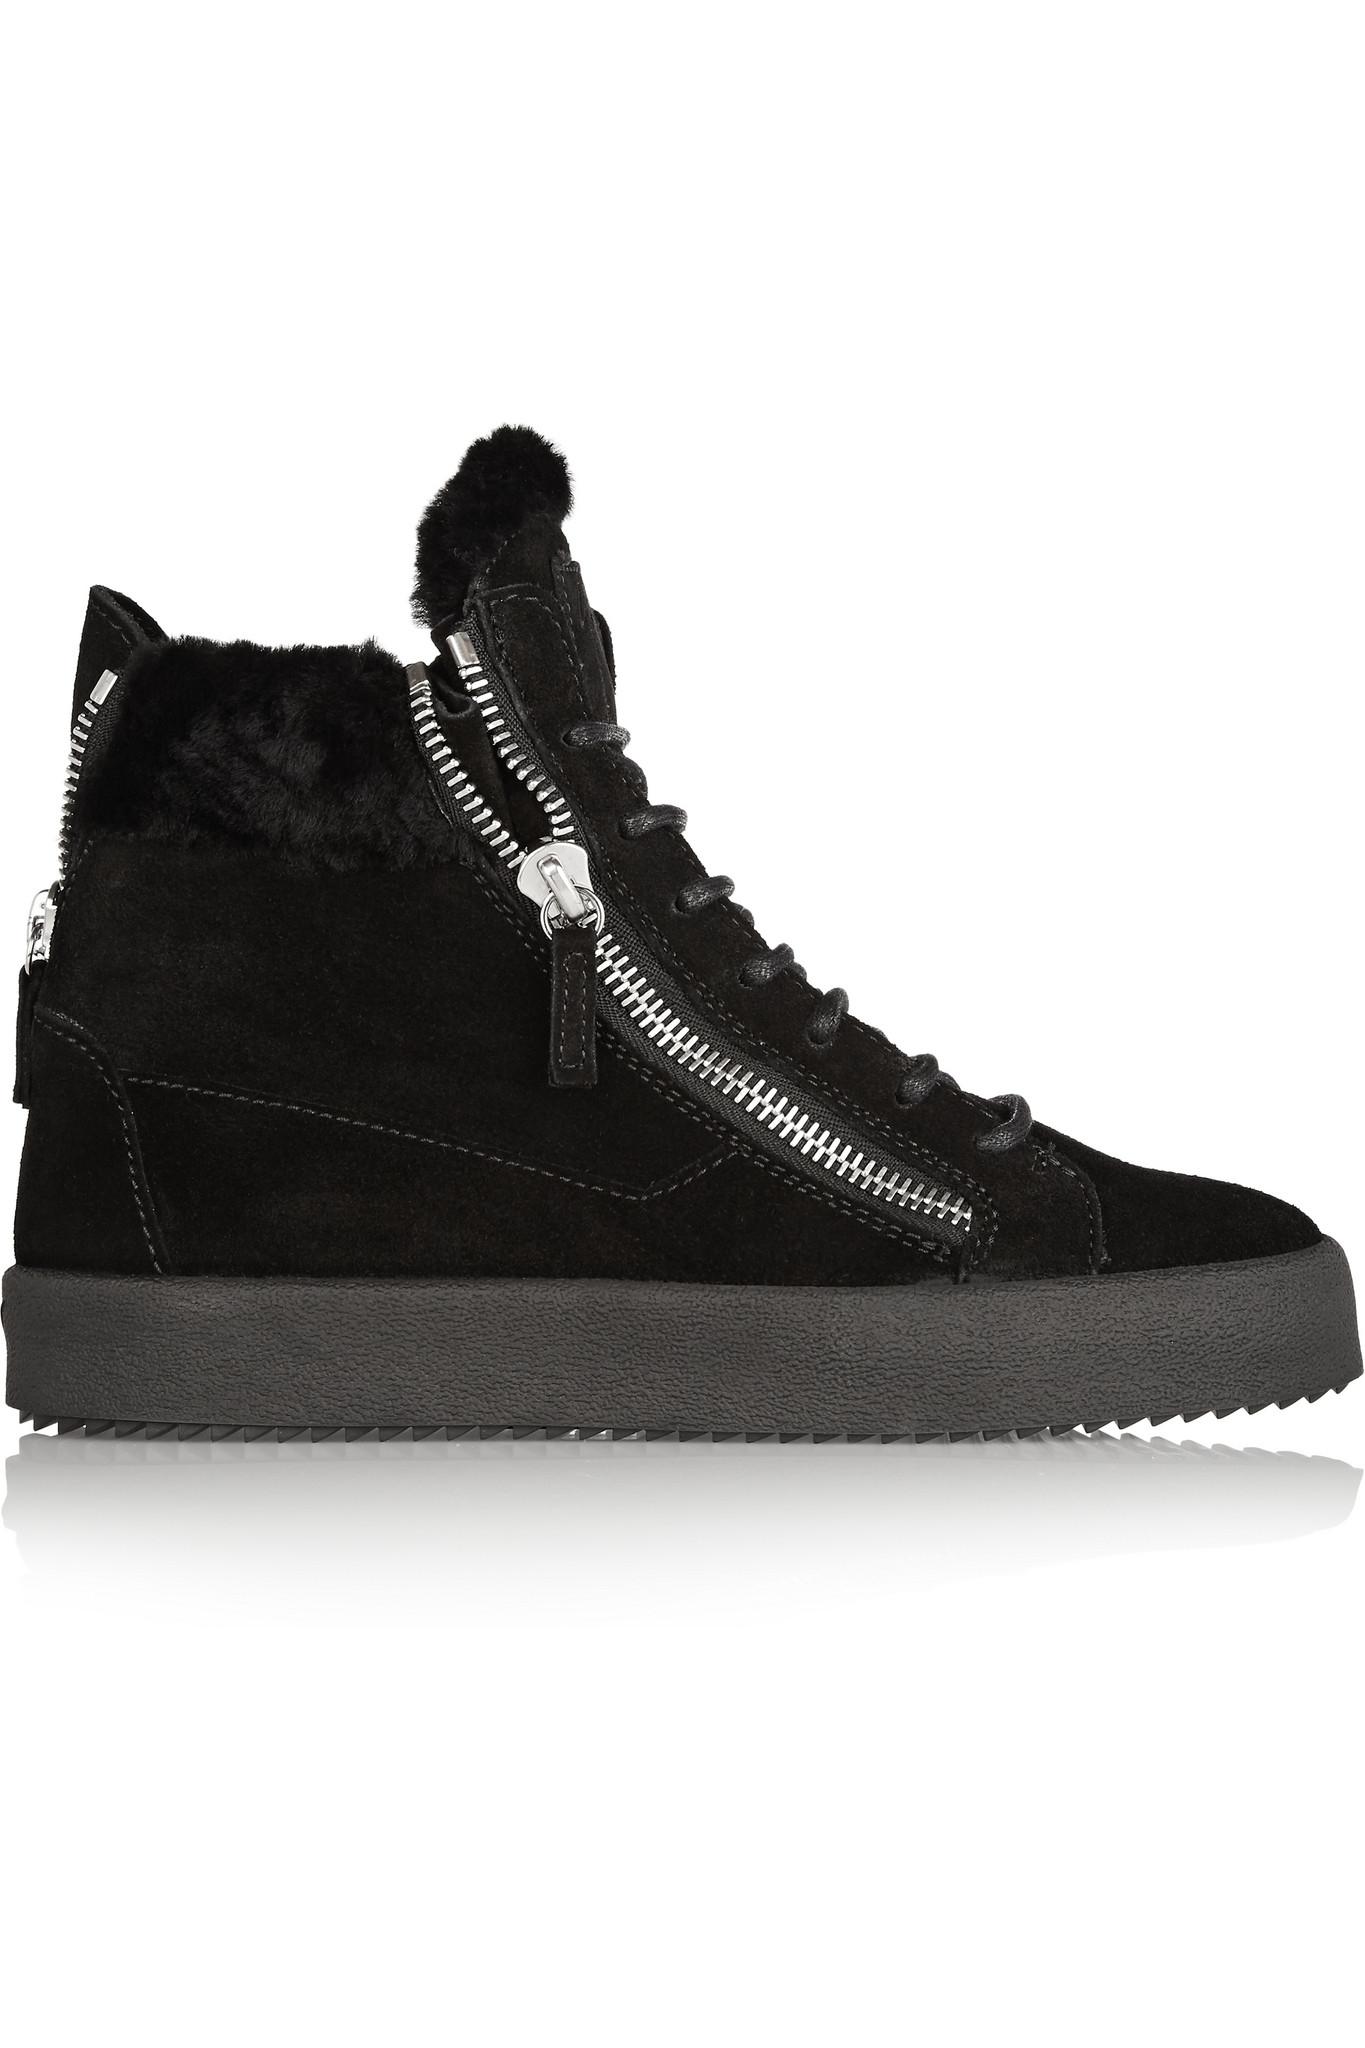 Giuseppe Zanotti Black May London High-Top Sneakers 6U7wEDztFY